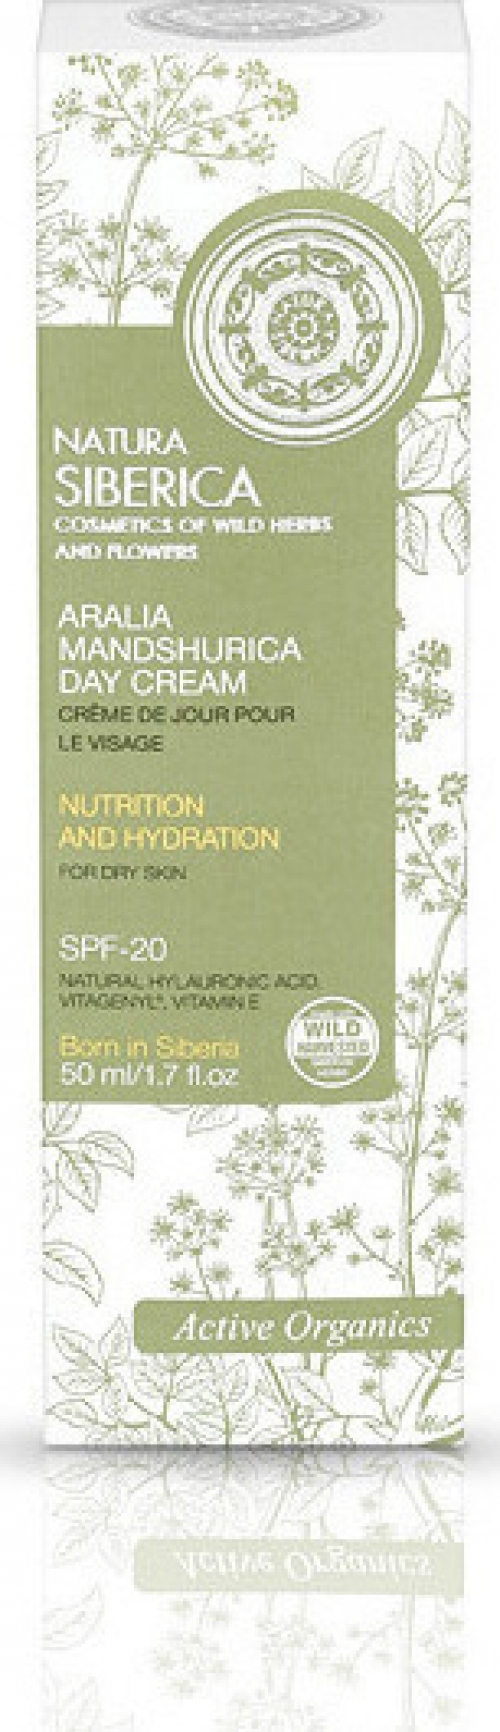 Aralia Mandshurica Day Cream, Θρέψη και Ενυδάτωση, για ξηρό δέρμα, με αντιηλιακή προστασία SPF-20, 50ml (Κατάλληλο για ηλικίες 22+)